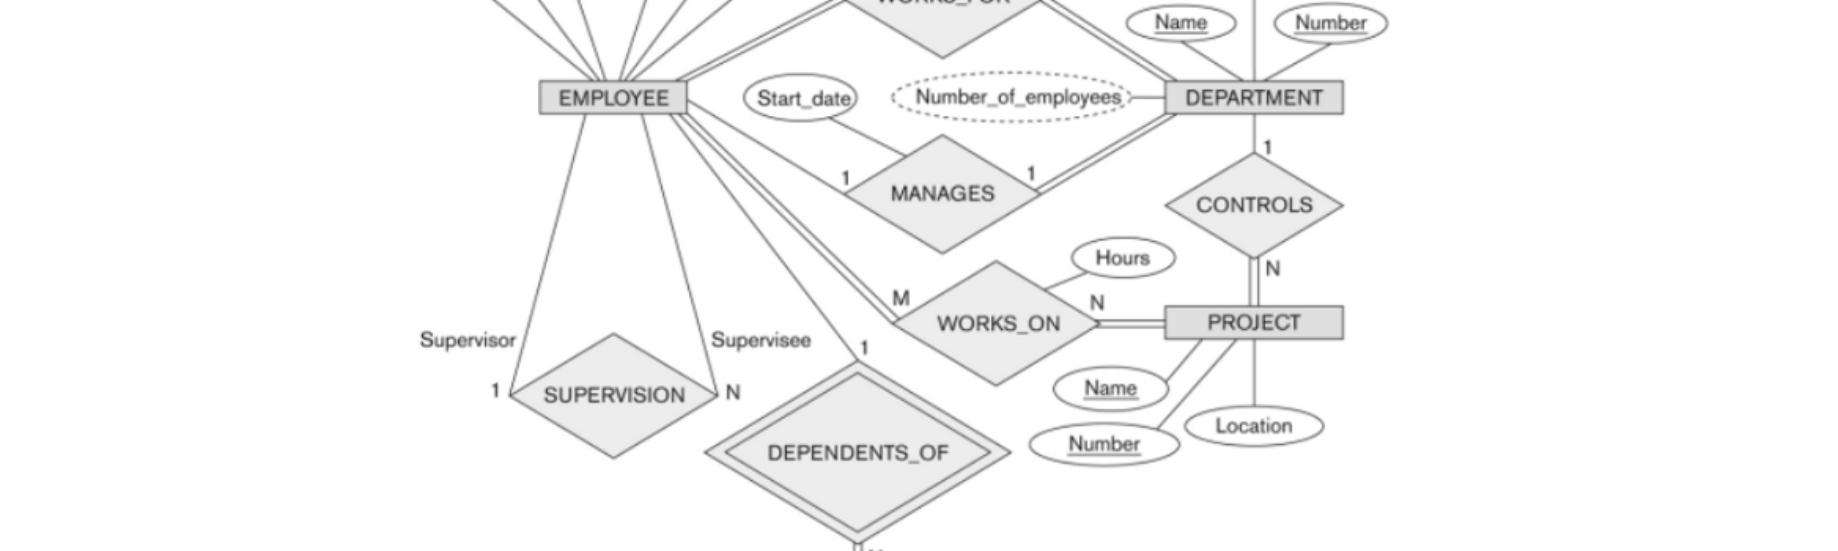 Database — Modeling : Entity Relationship Diagram (Erd) (Part 5) intended for Er Diagram 1 M N